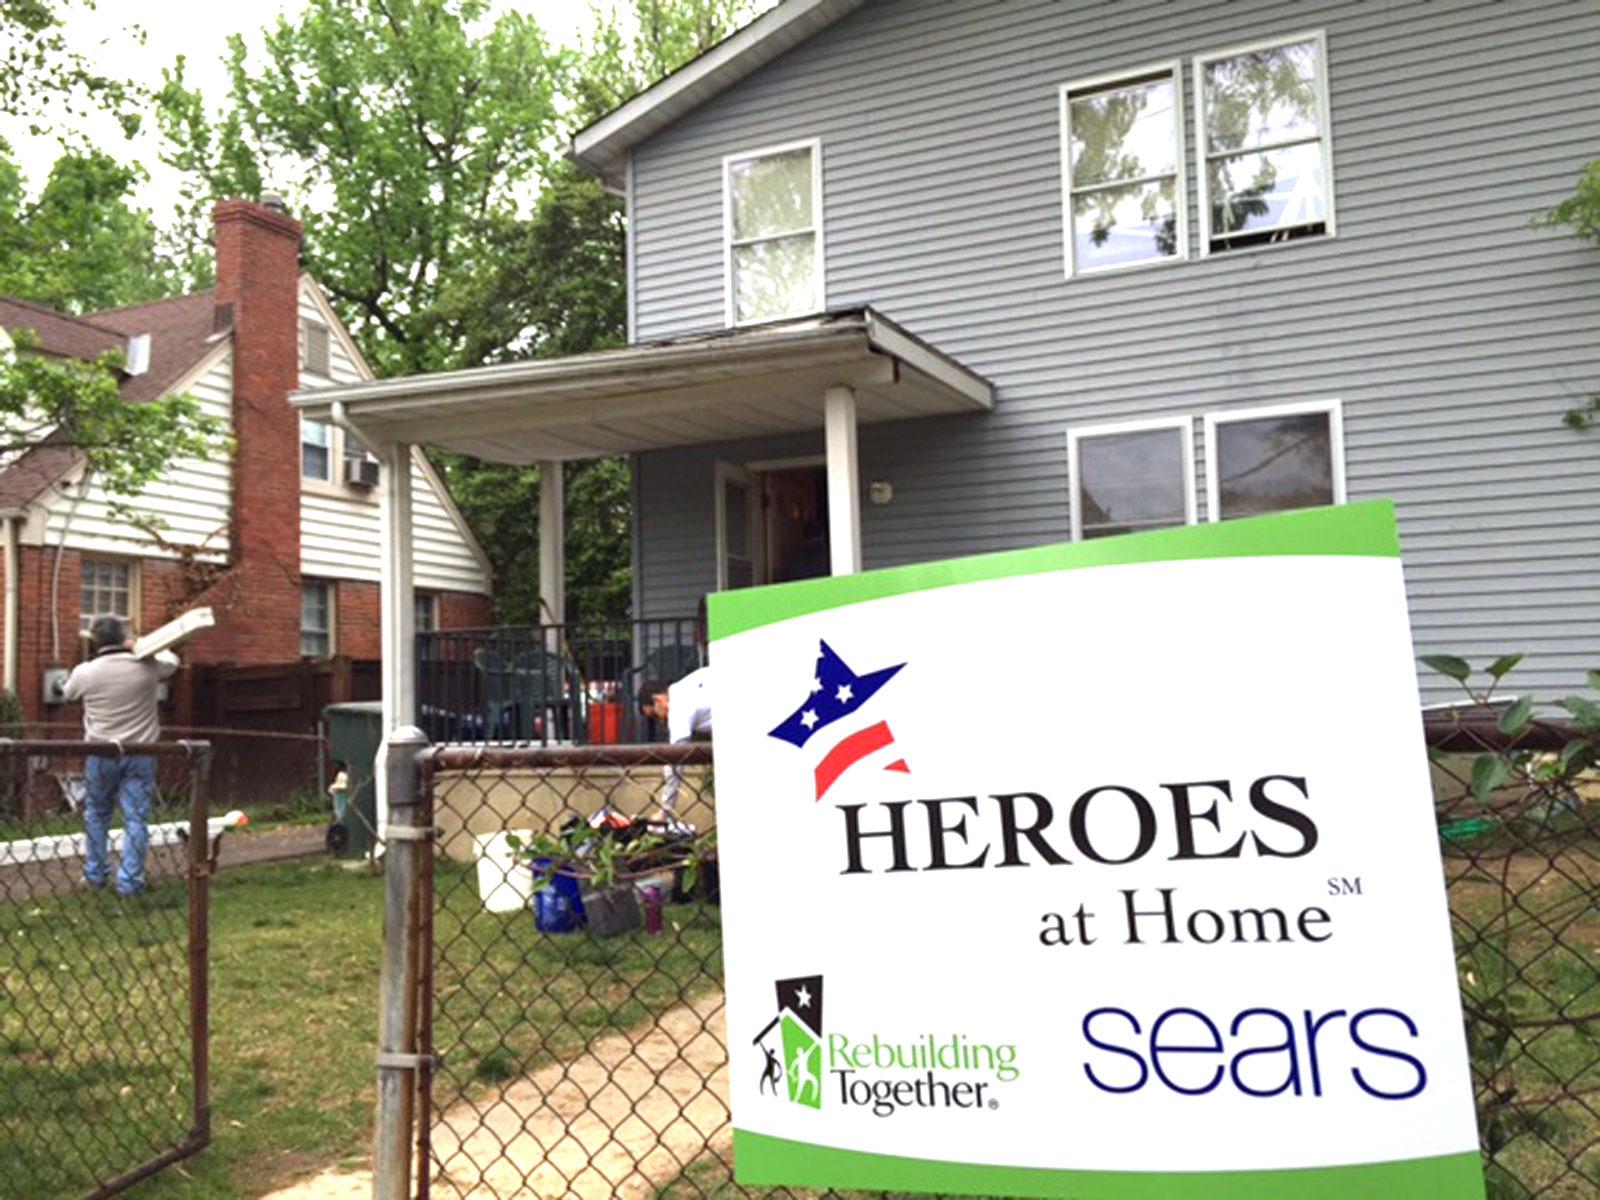 Hundreds in Alexandria, Va. make free home repairs for neighbors